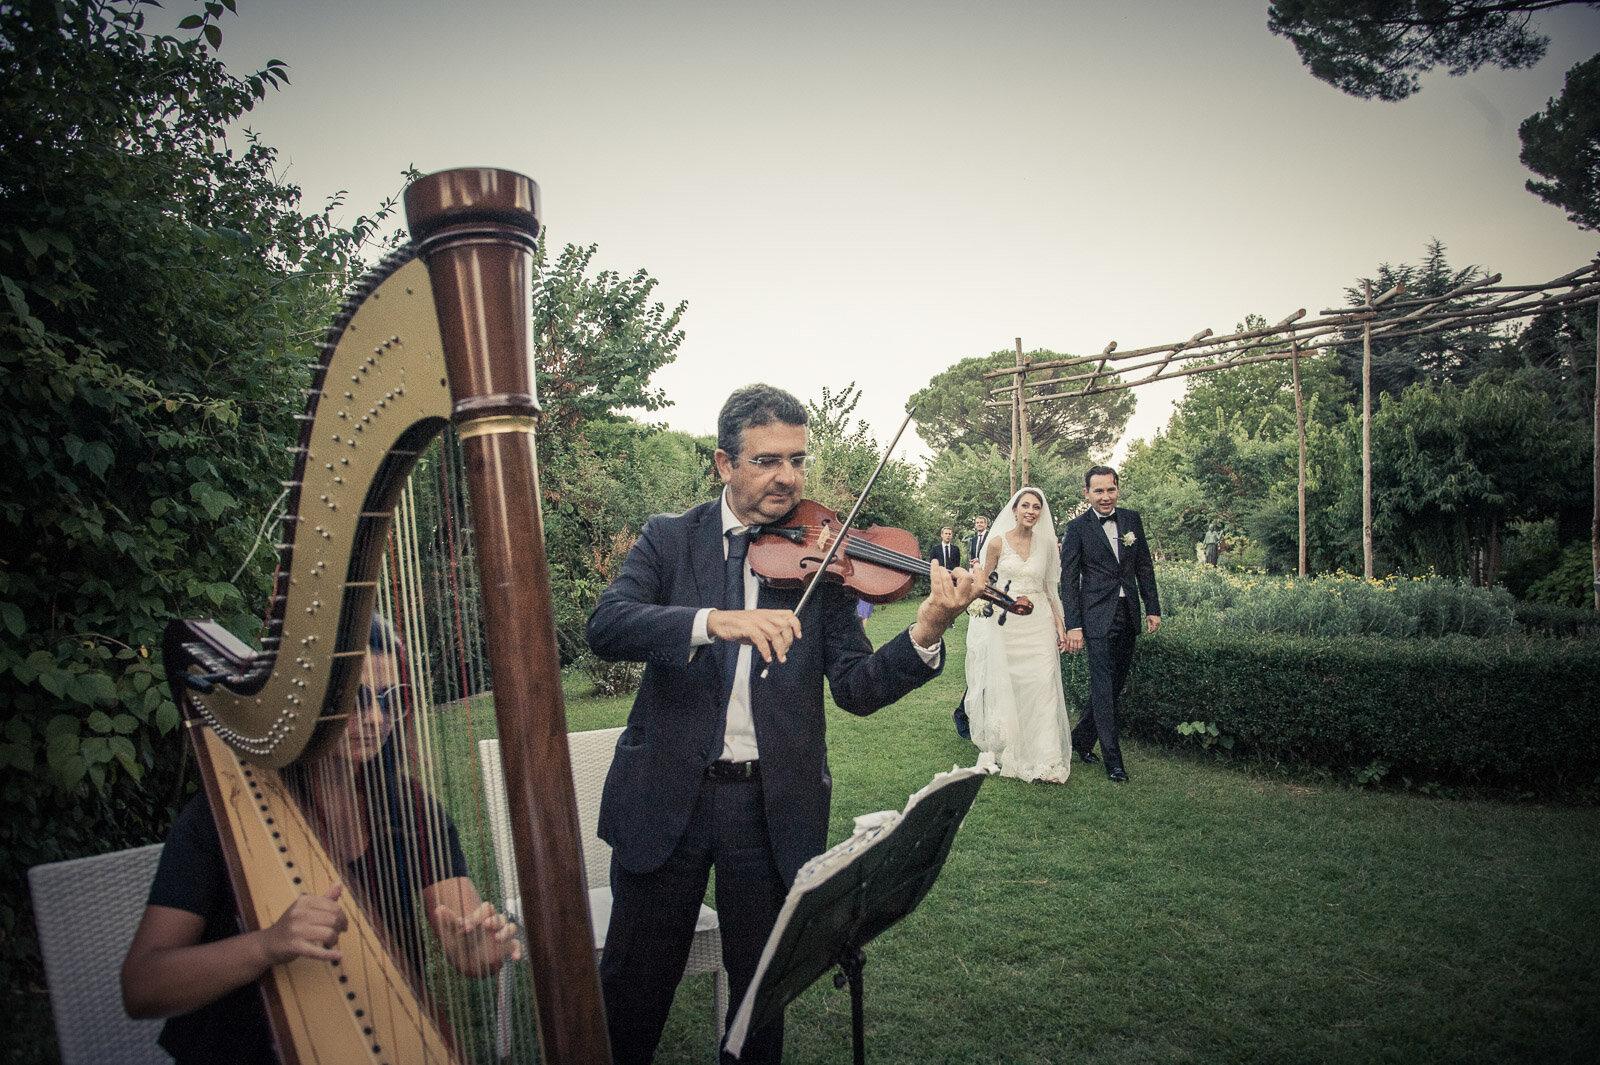 Russian Wedding in Villa Cimbrone Costiera Amalfitana 19.jpg